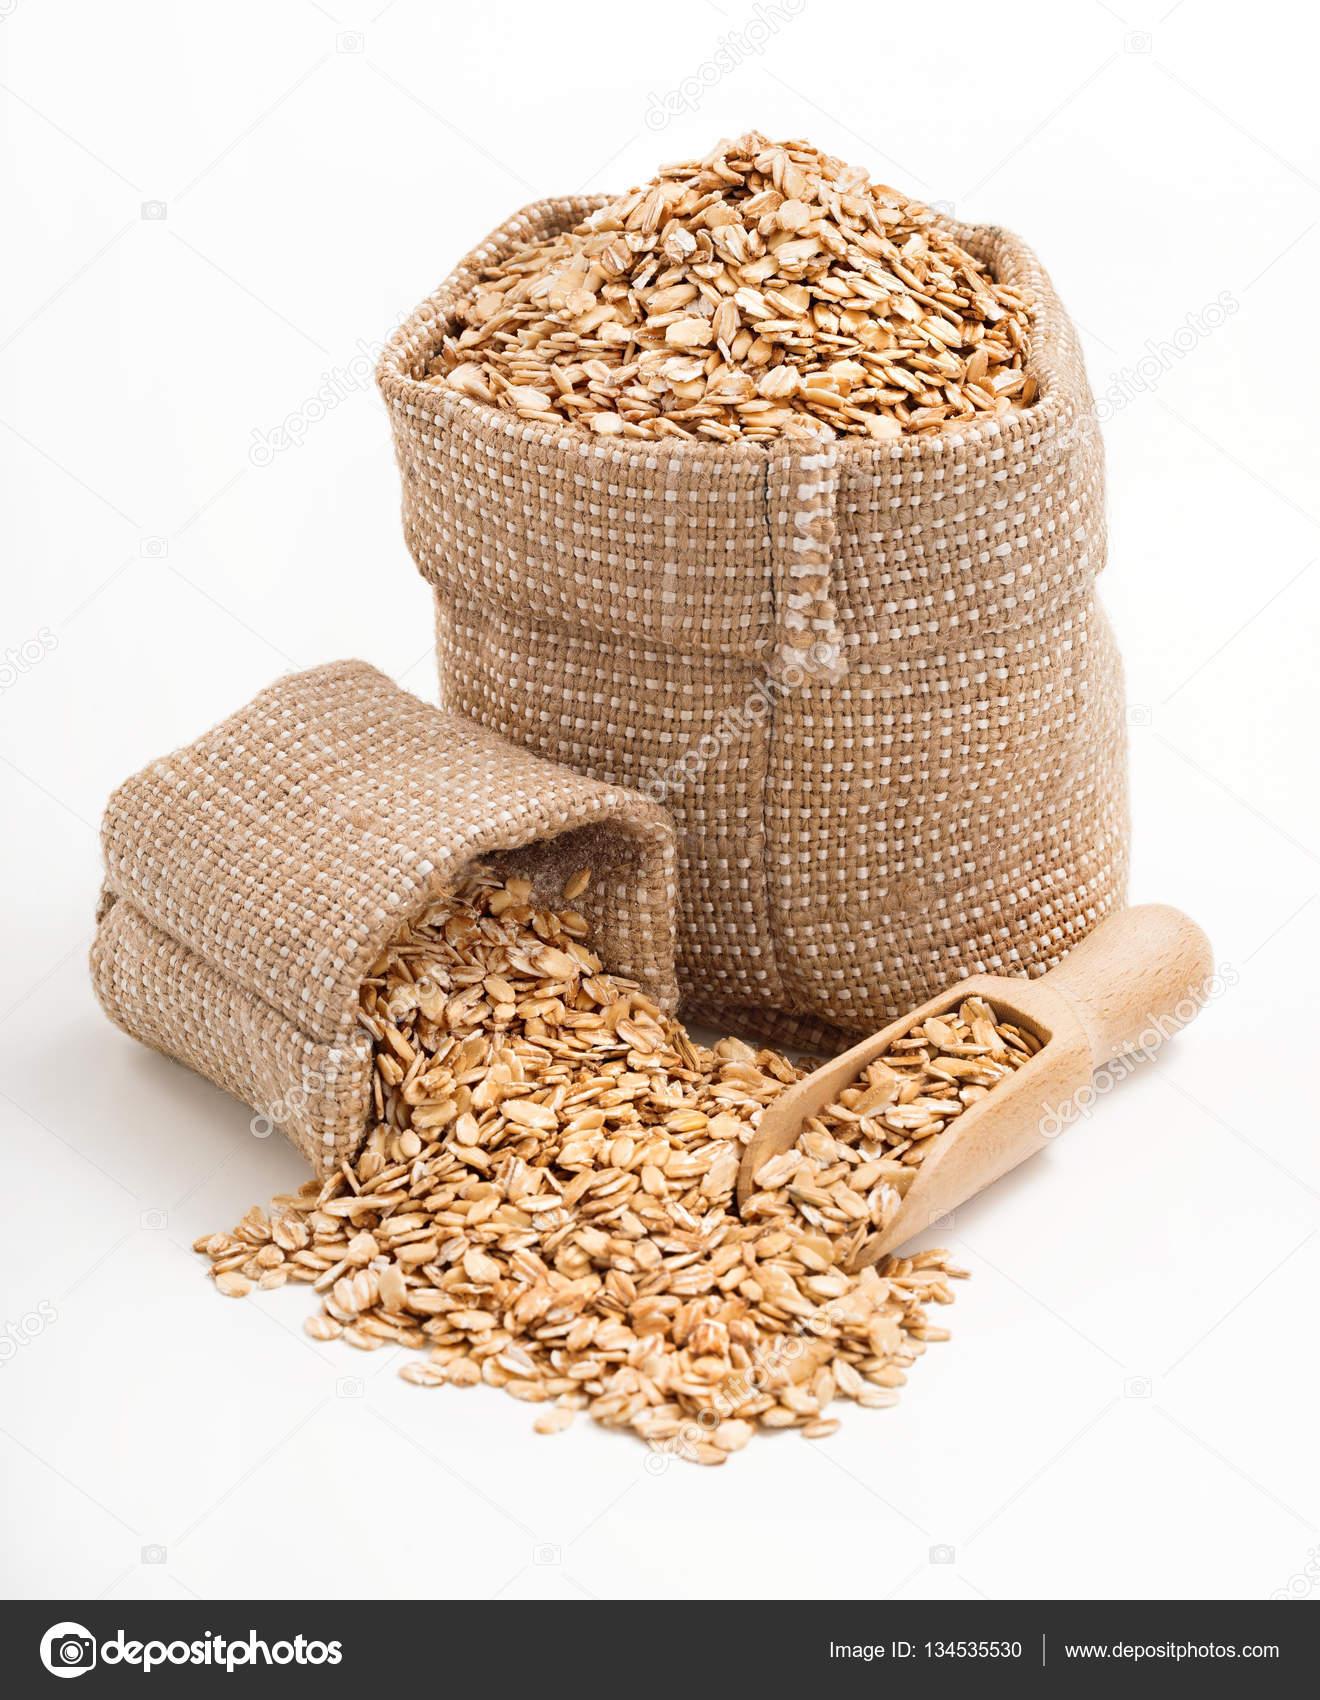 harina de avena en bolsa de arpillera con cucharada de madera aislada sobre fondo blanco u